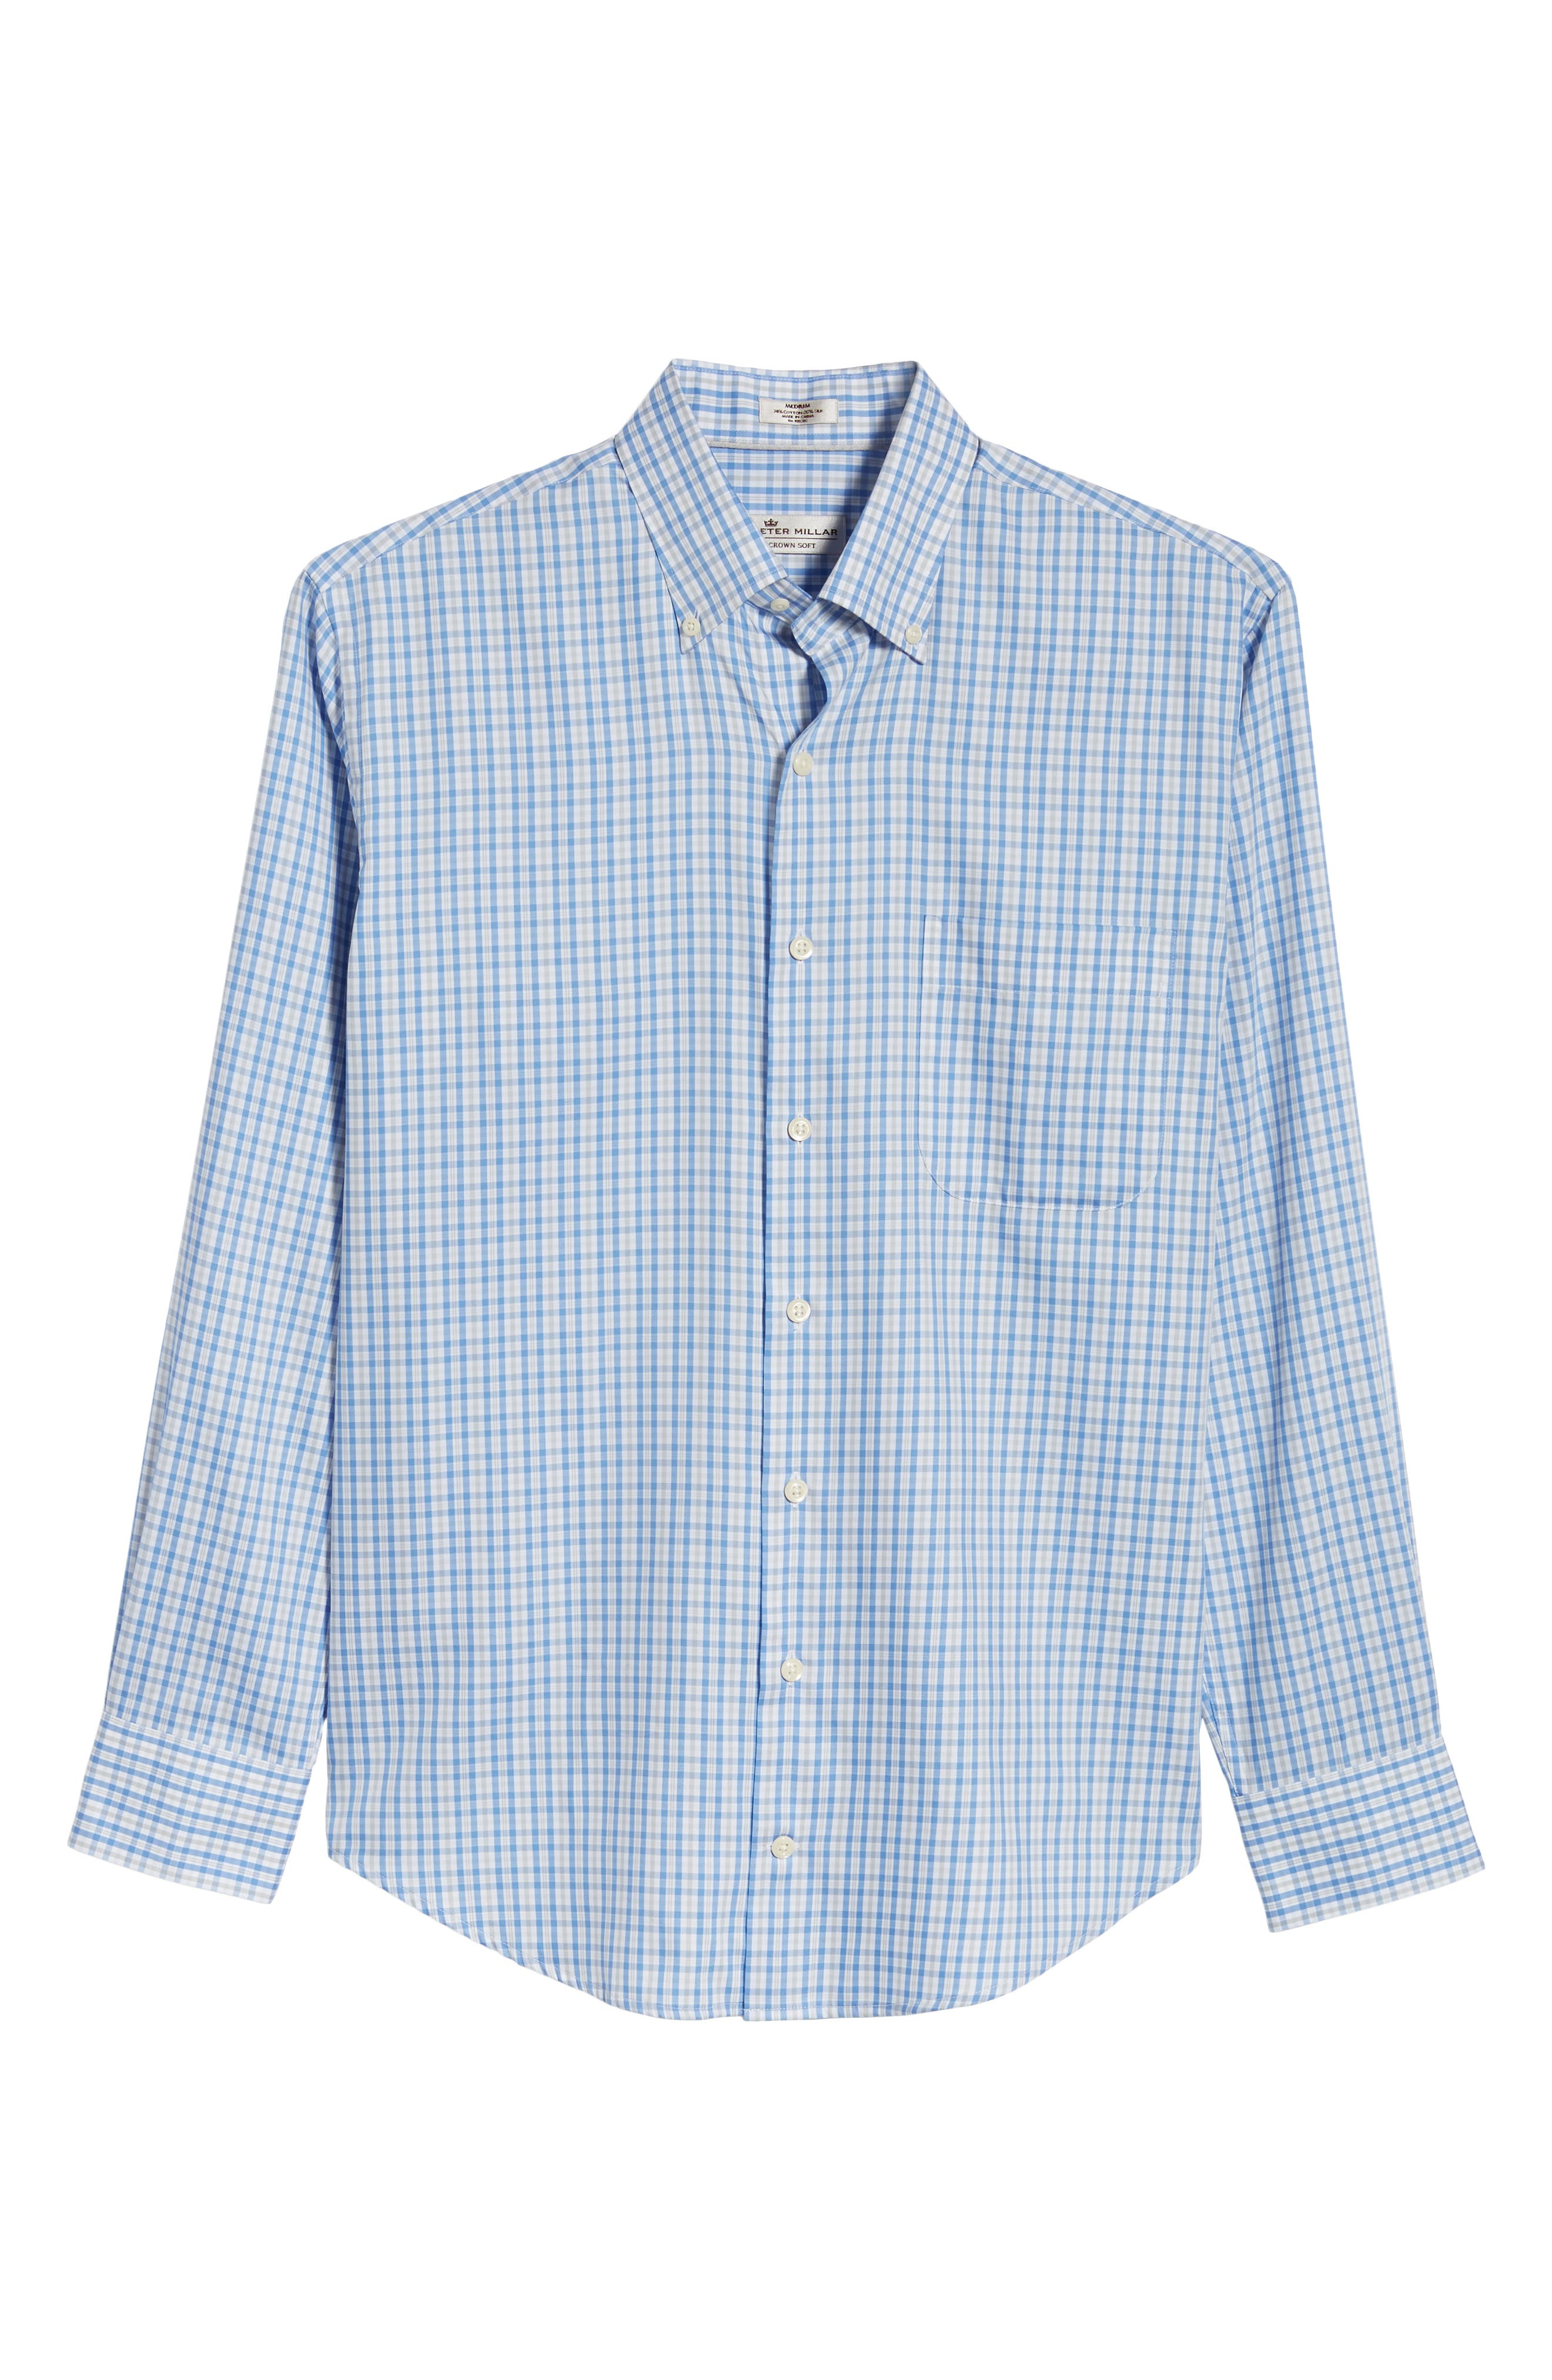 Crown Soft First Hill Plaid Sport Shirt,                             Alternate thumbnail 6, color,                             485